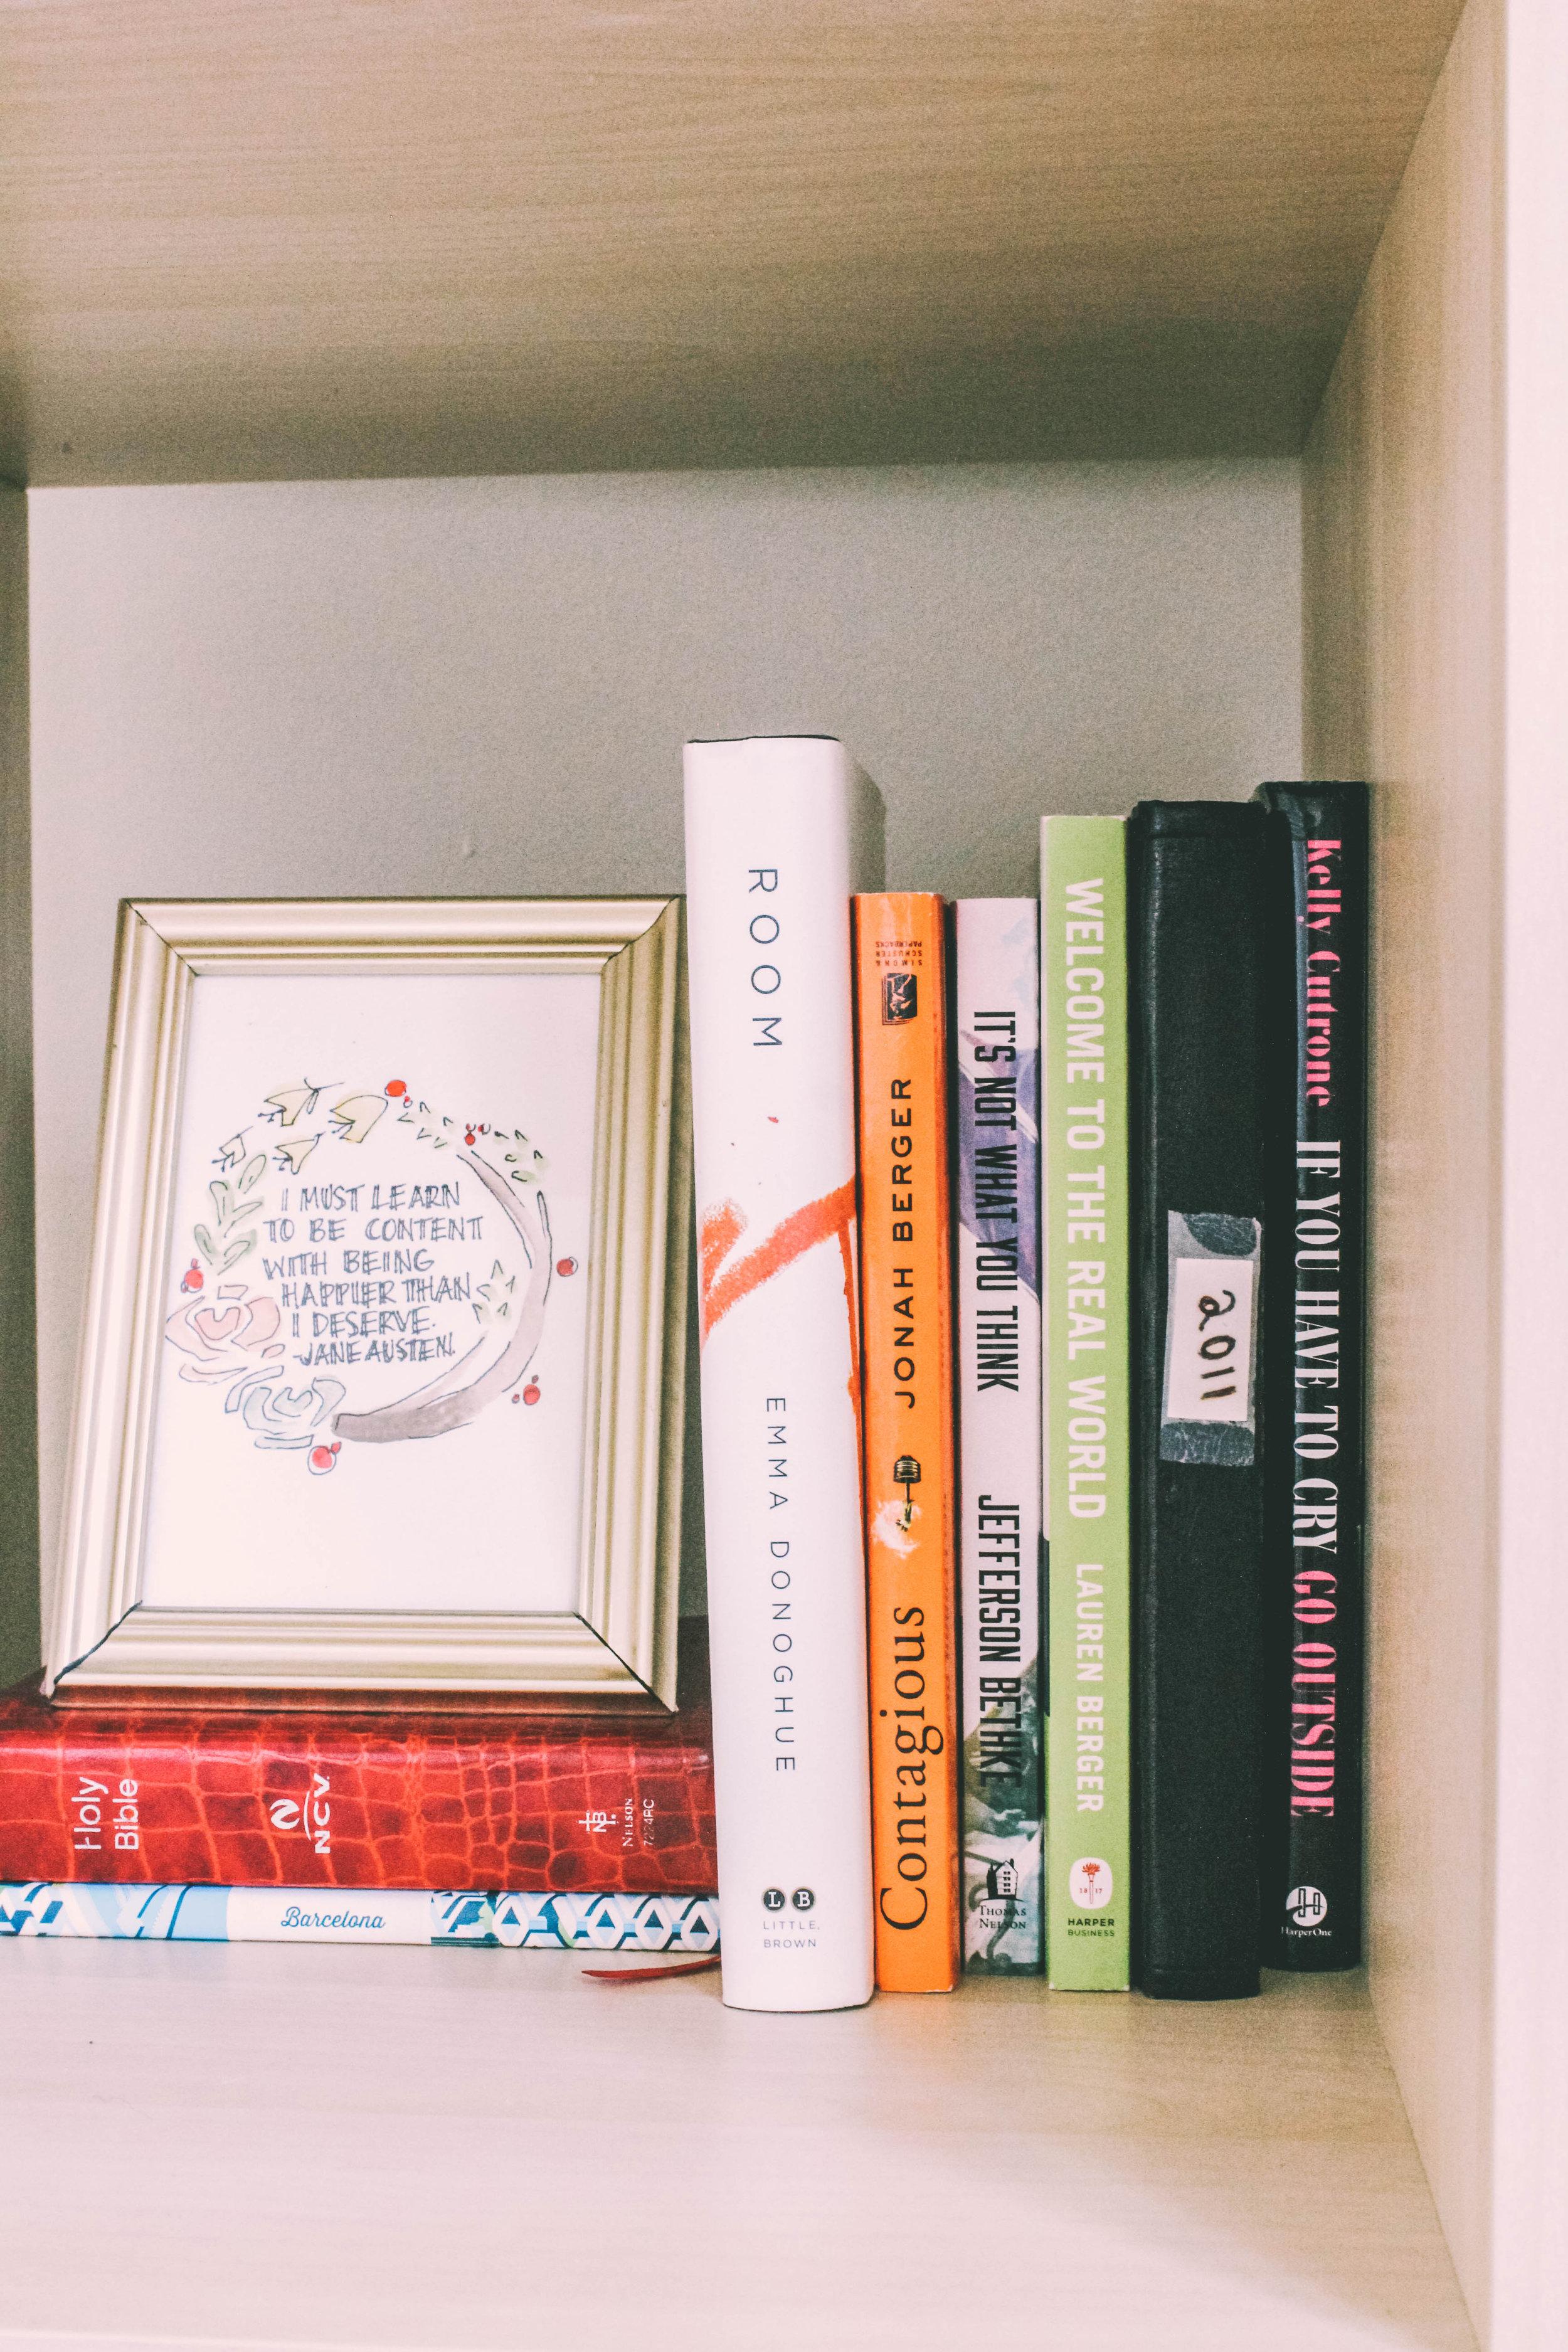 Home office decor ideas | Lindsay Scholz | Brand and social media designer for creatives